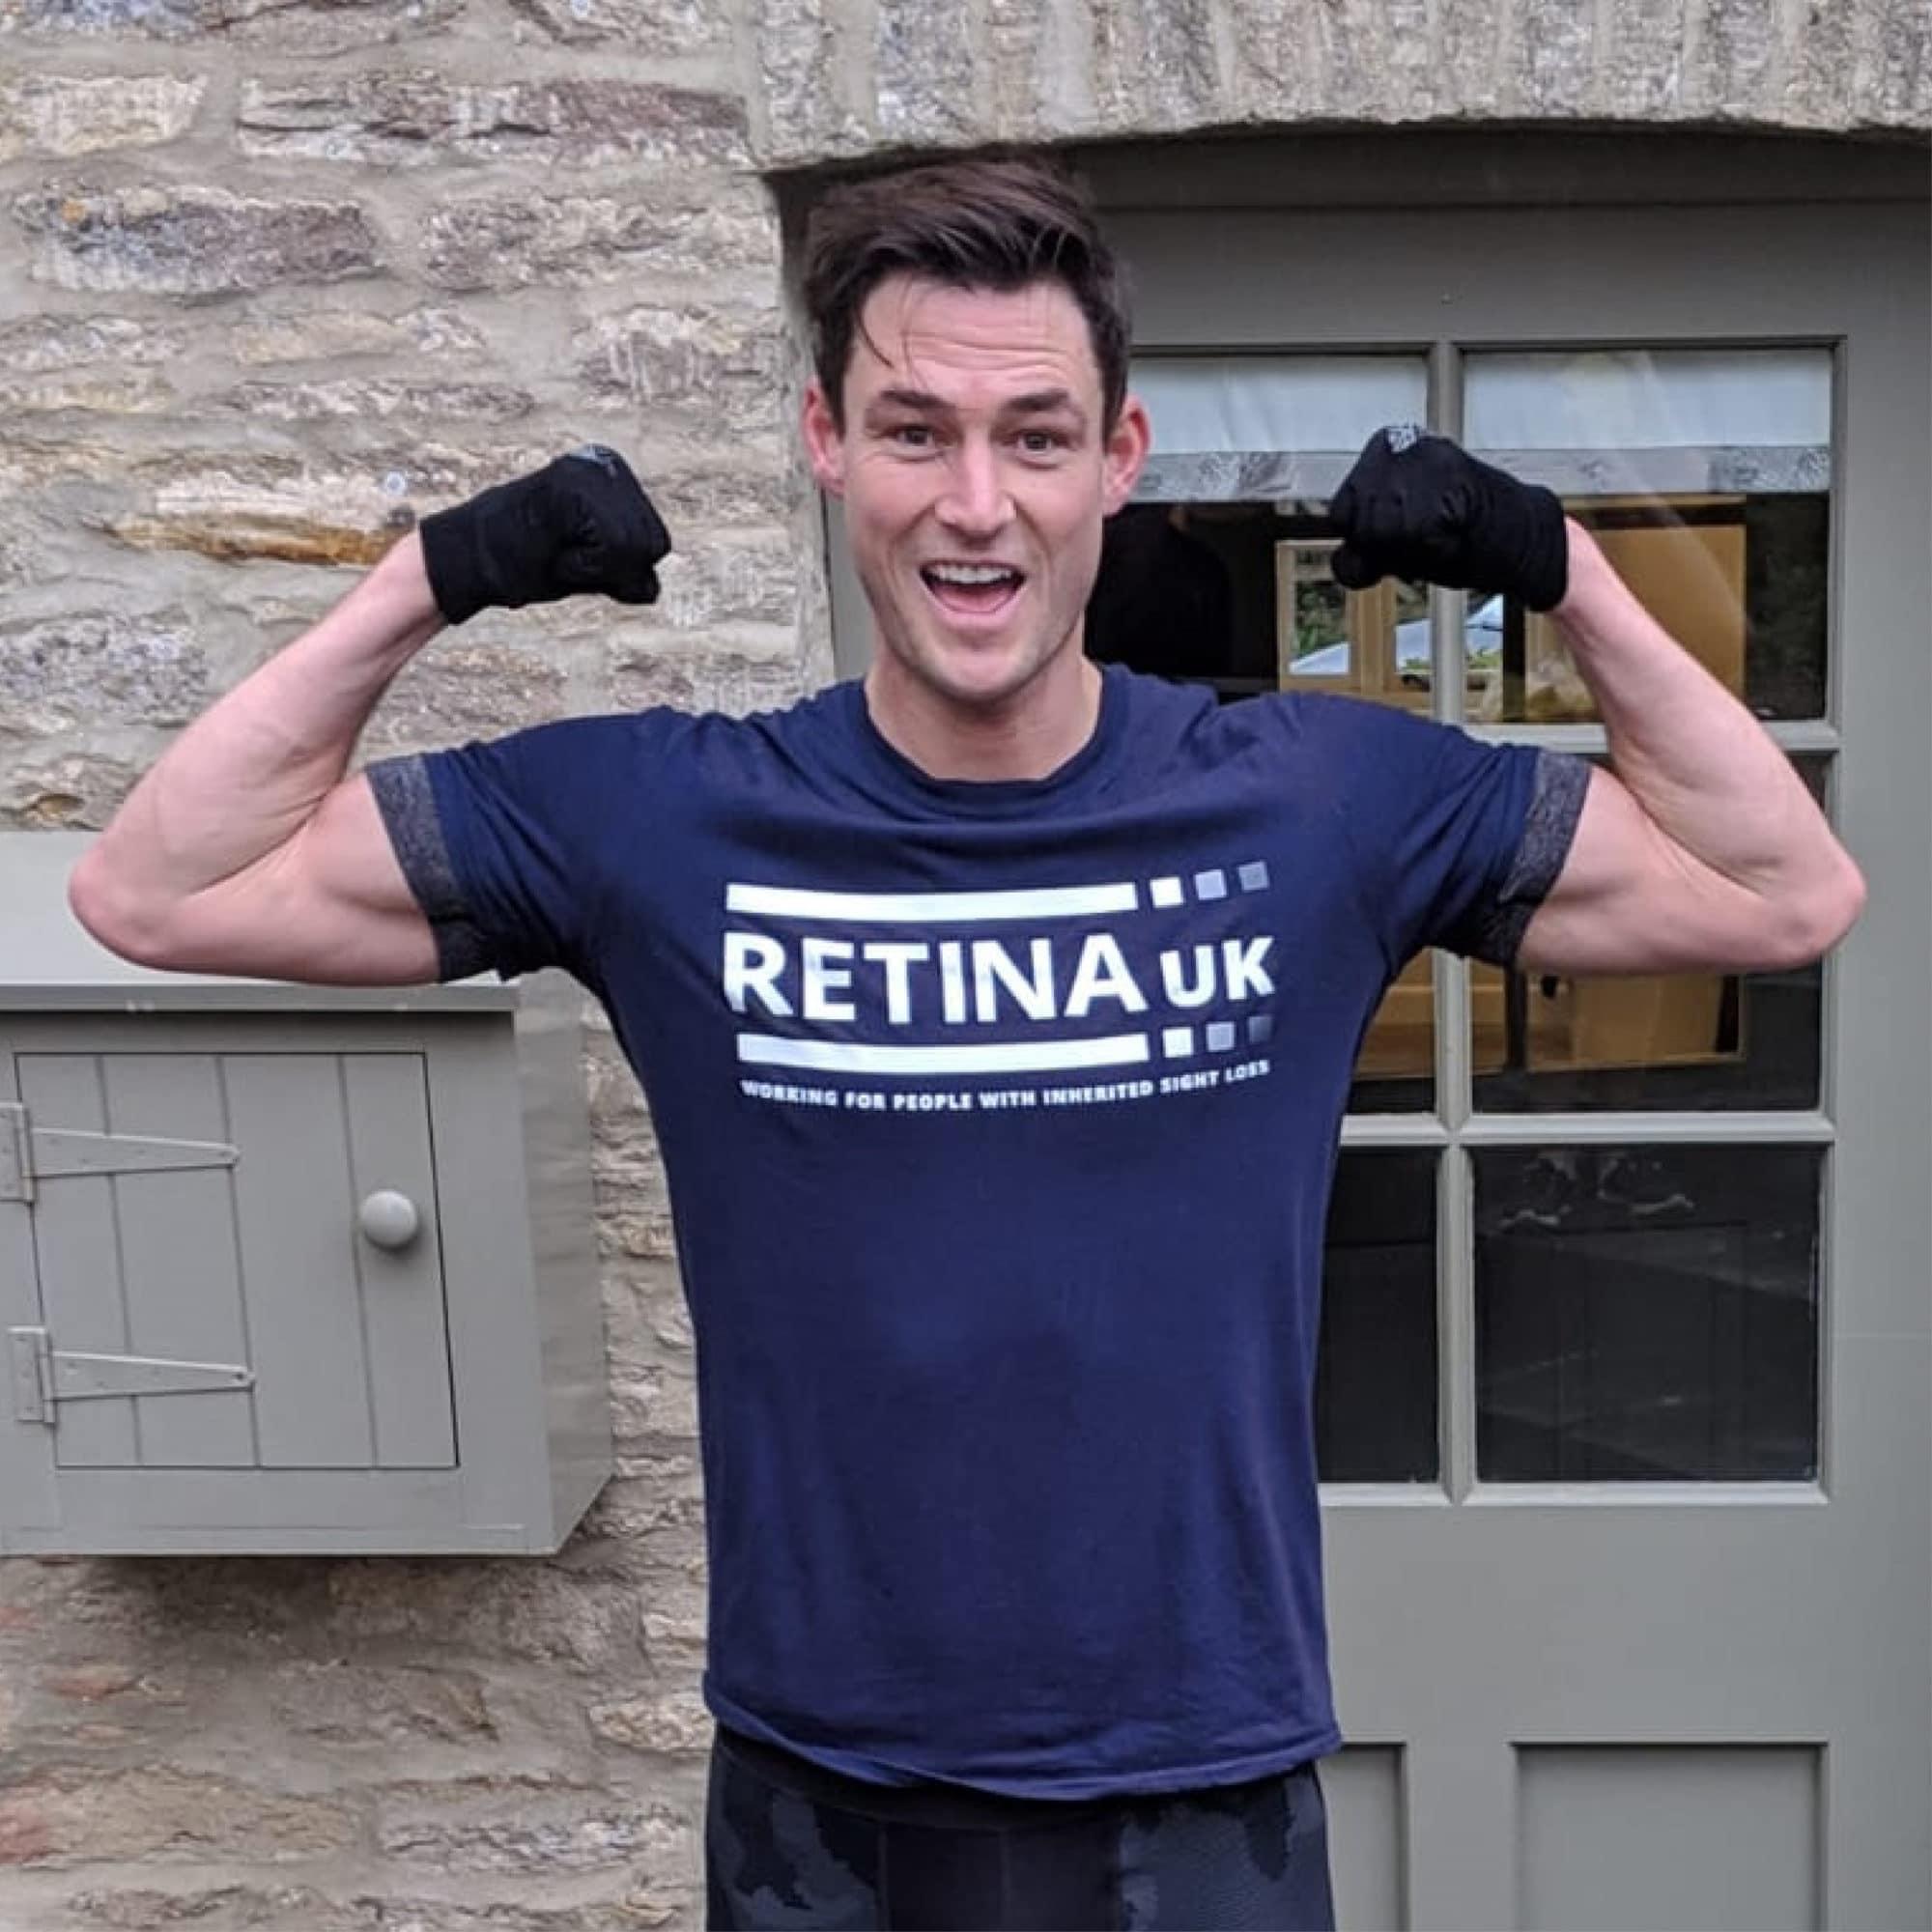 James Farrar wearing a Retina UK tshirt